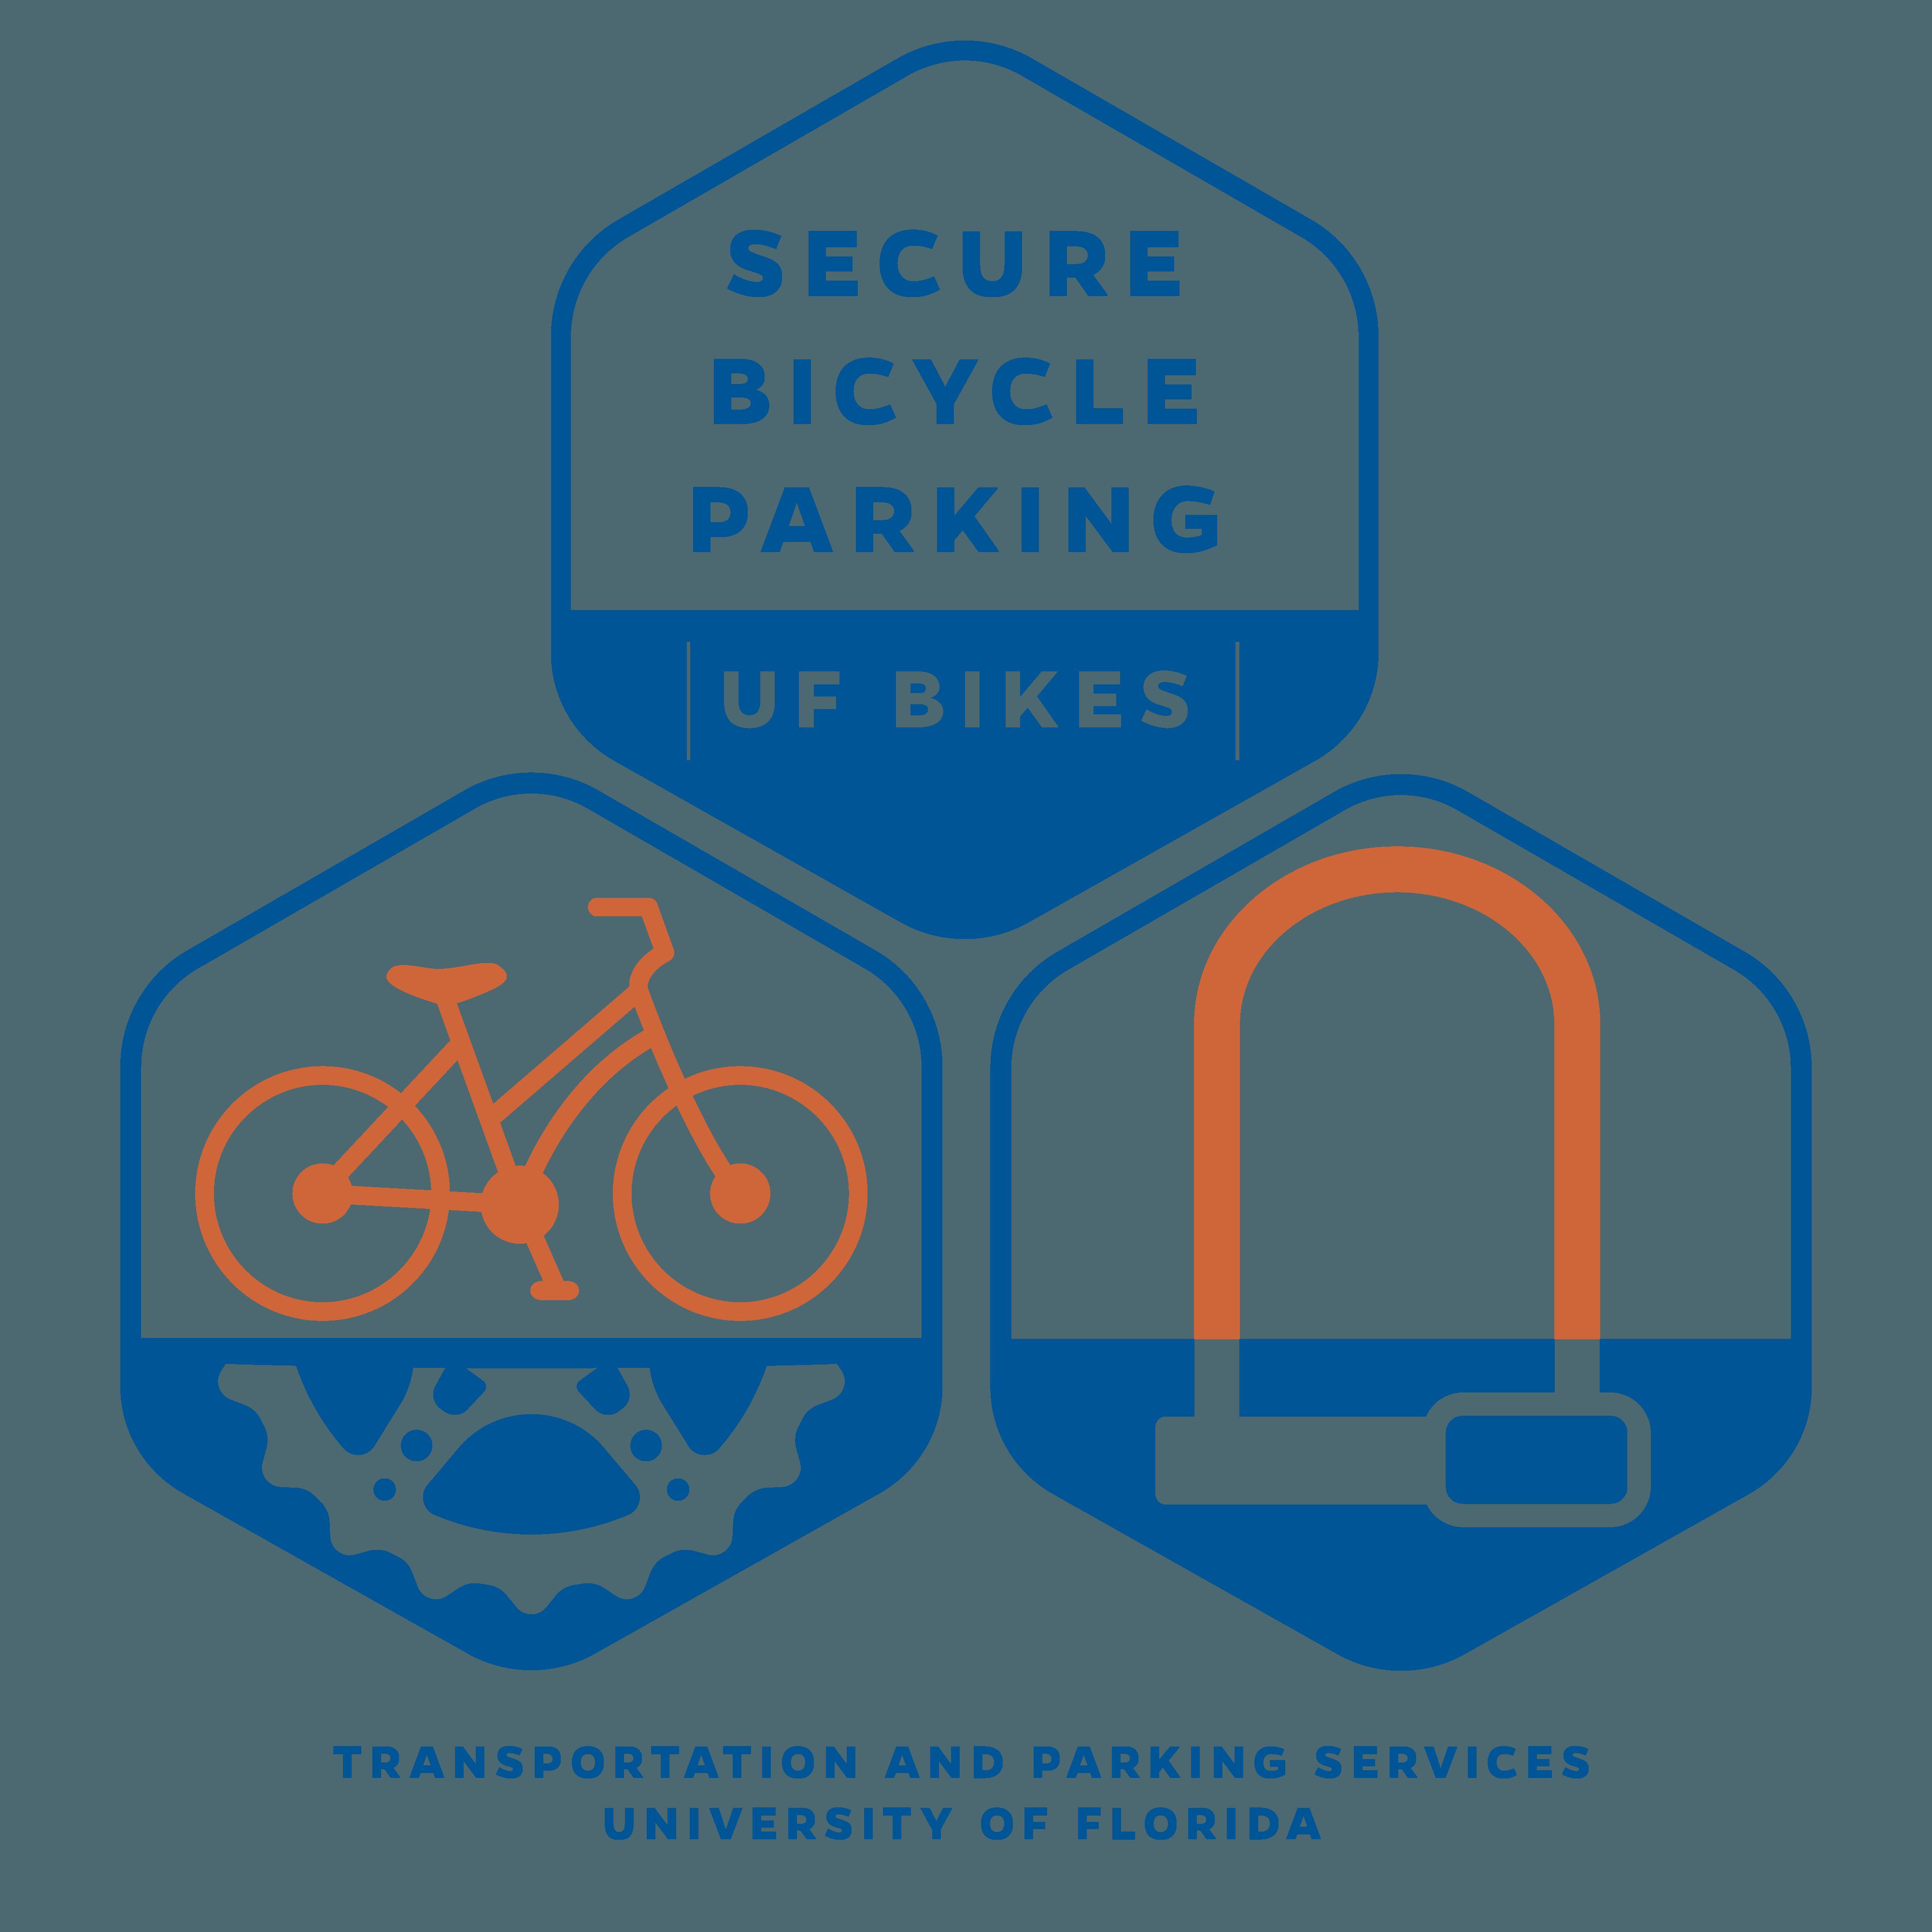 Secure Bicycle Parking